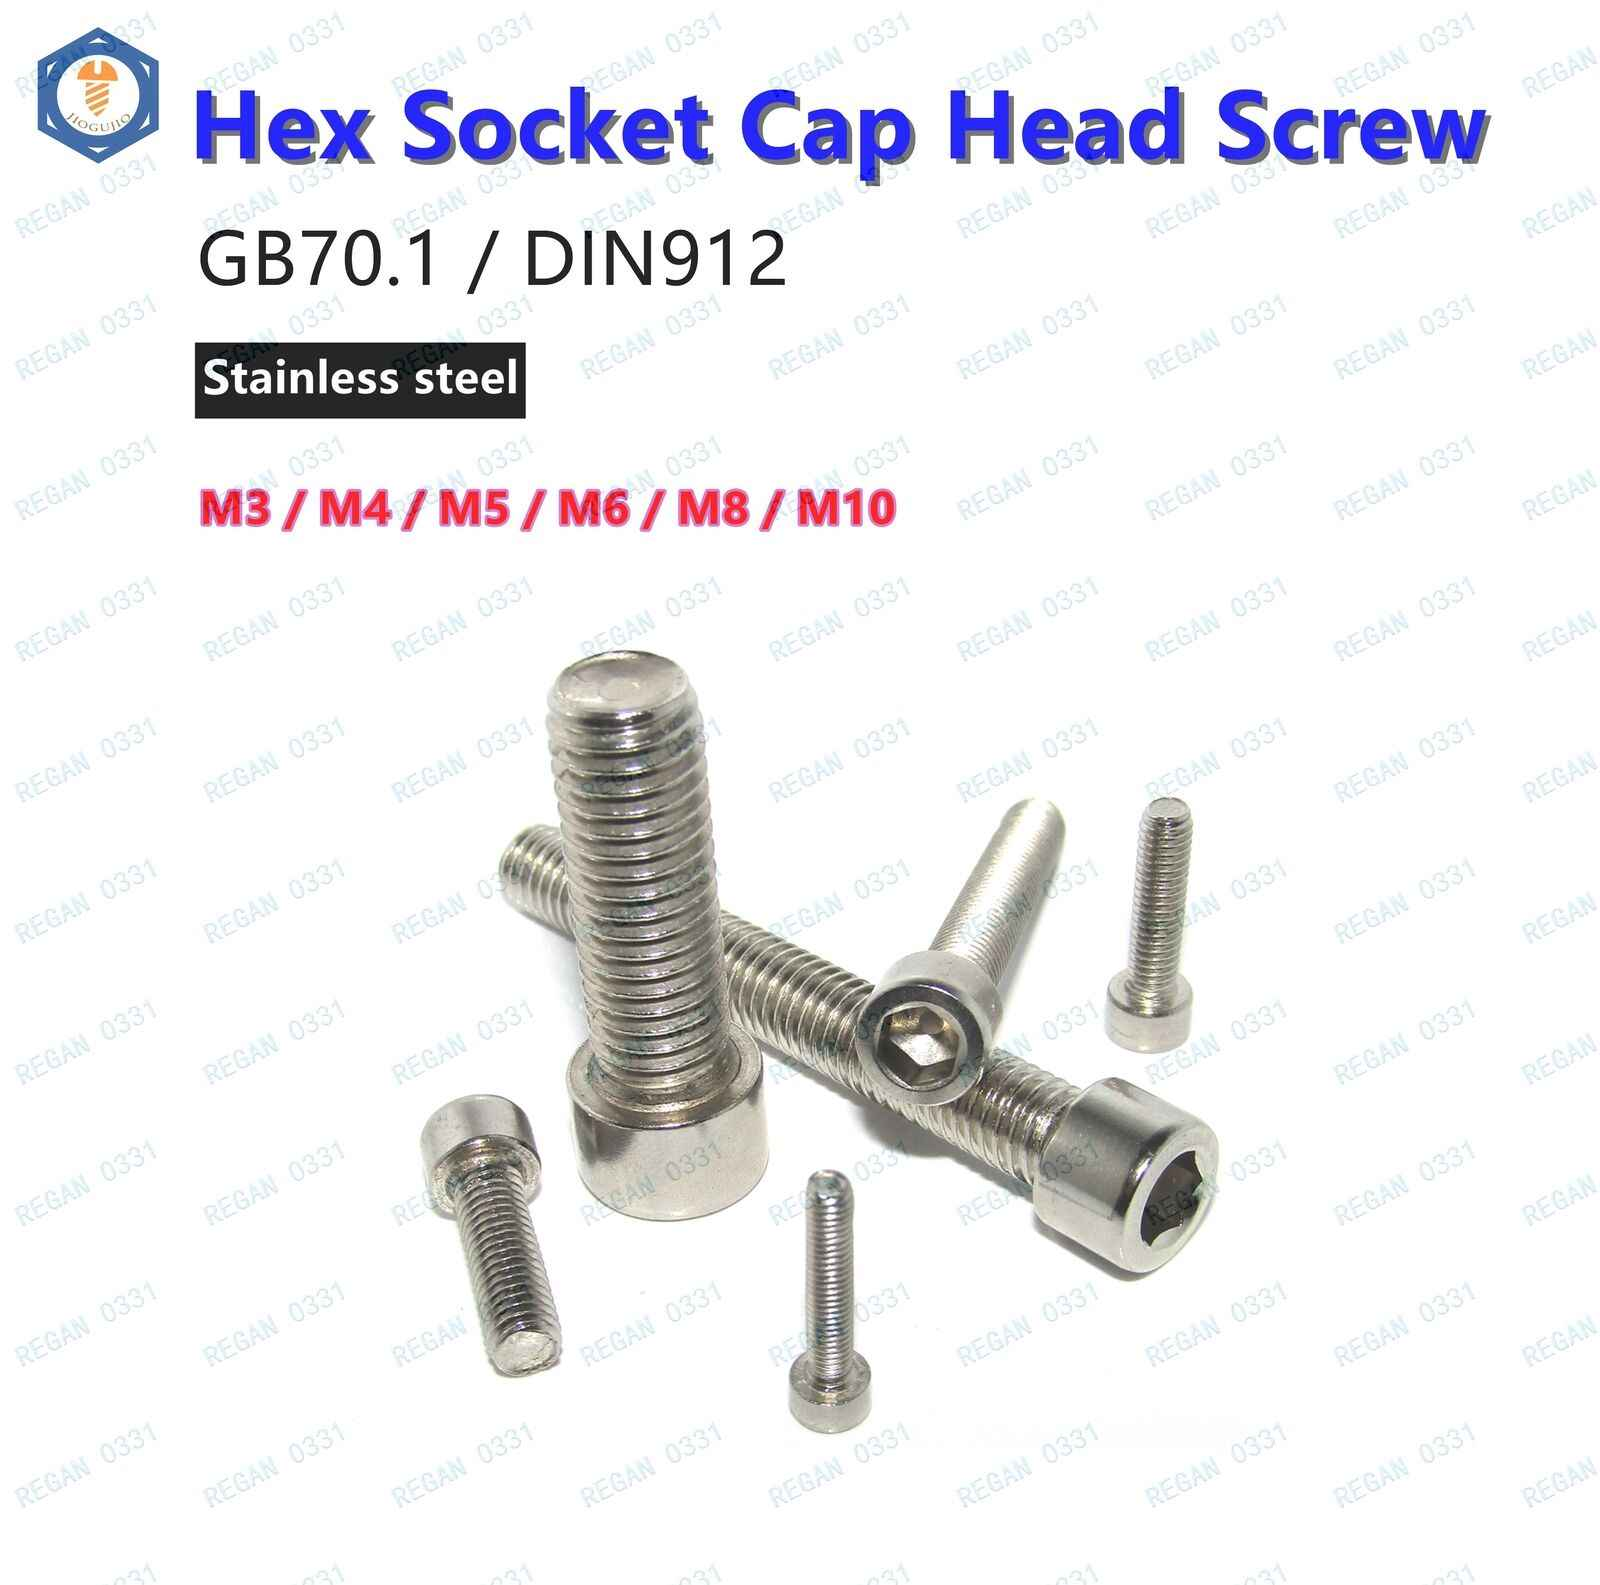 220x Stainless Steel Metric Socket Cap Screws Kit M3 M4 M5 M6 M8 DIN912 Repair